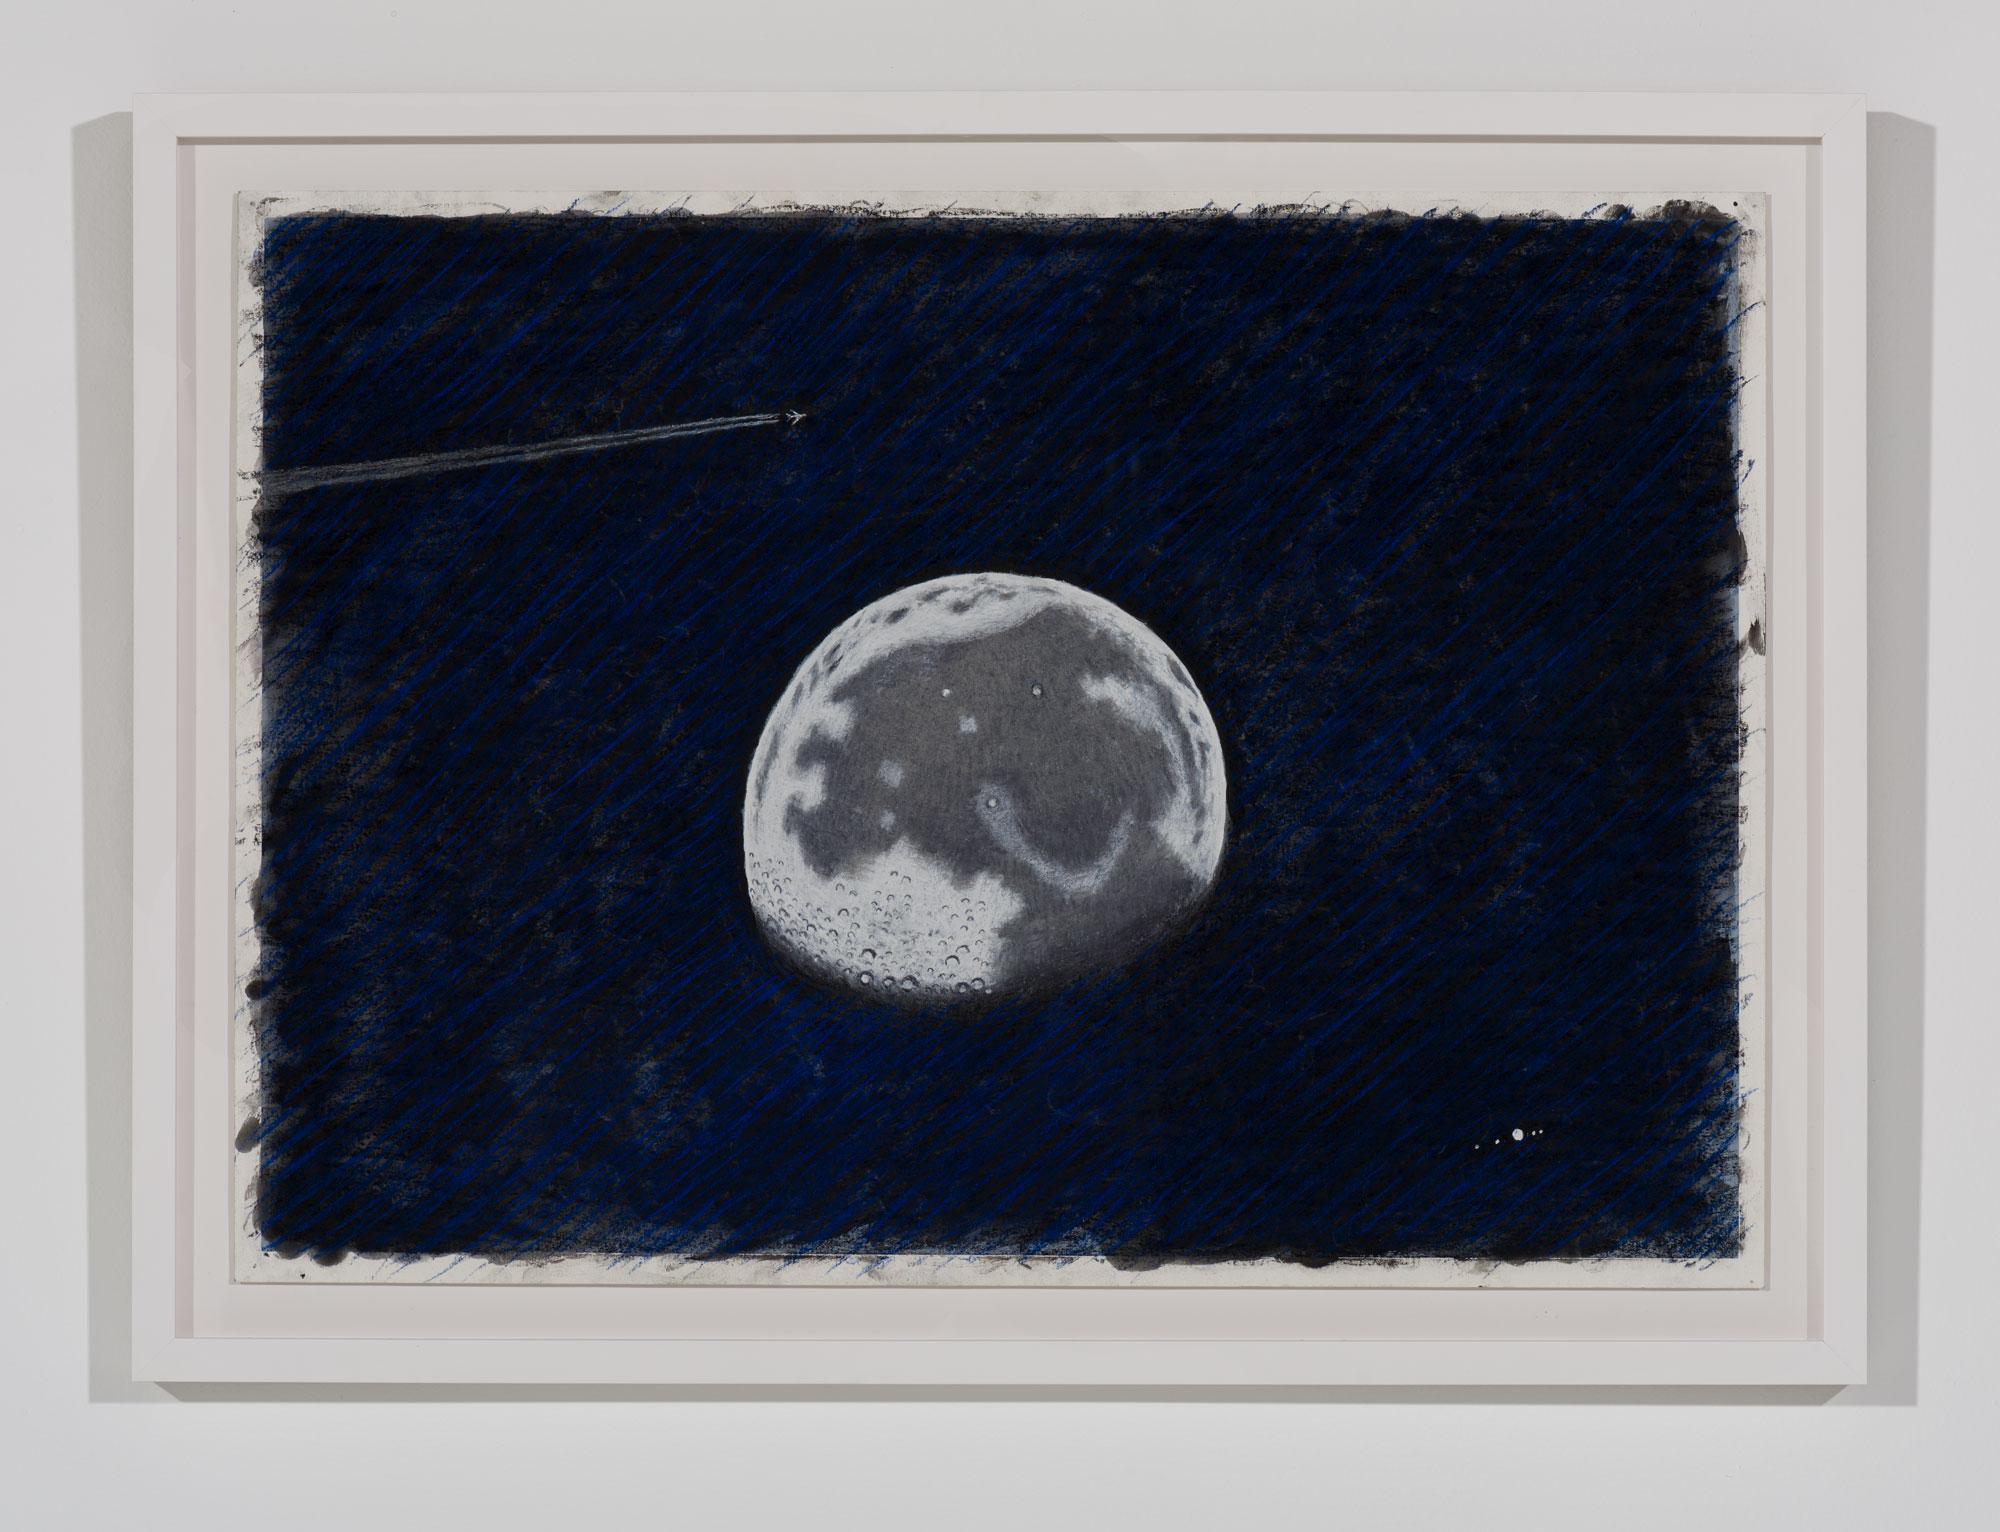 The Moon 8.30.18, 2018